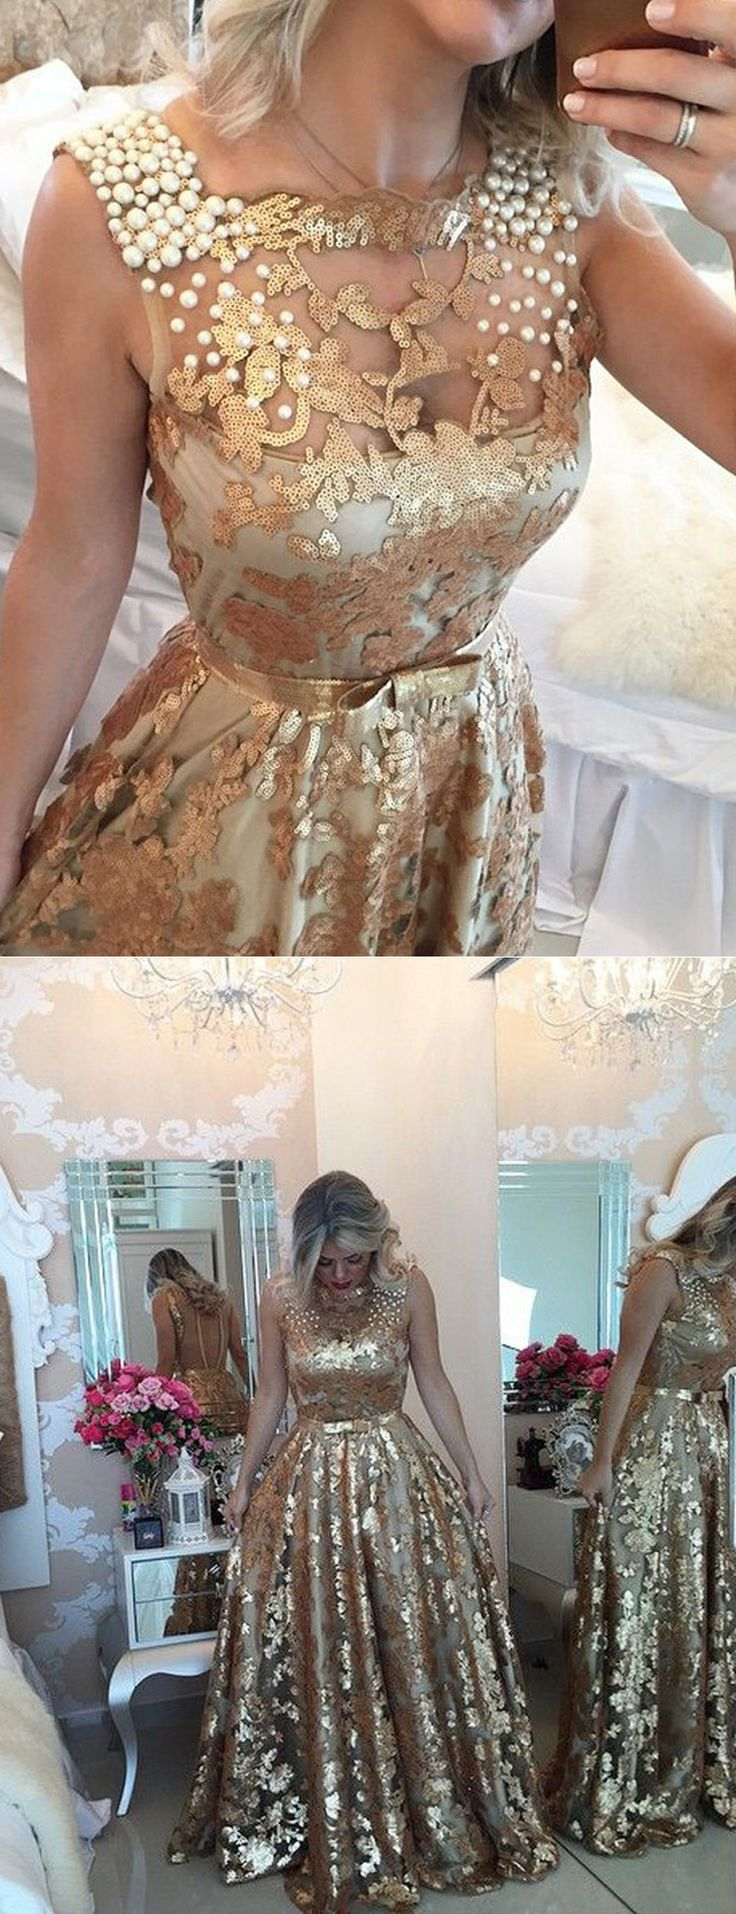 gold long prom dresses, 2017 prom dresses, gold sequins prom dresses, dresses for women, sexy prom dresses, vintage prom dresses